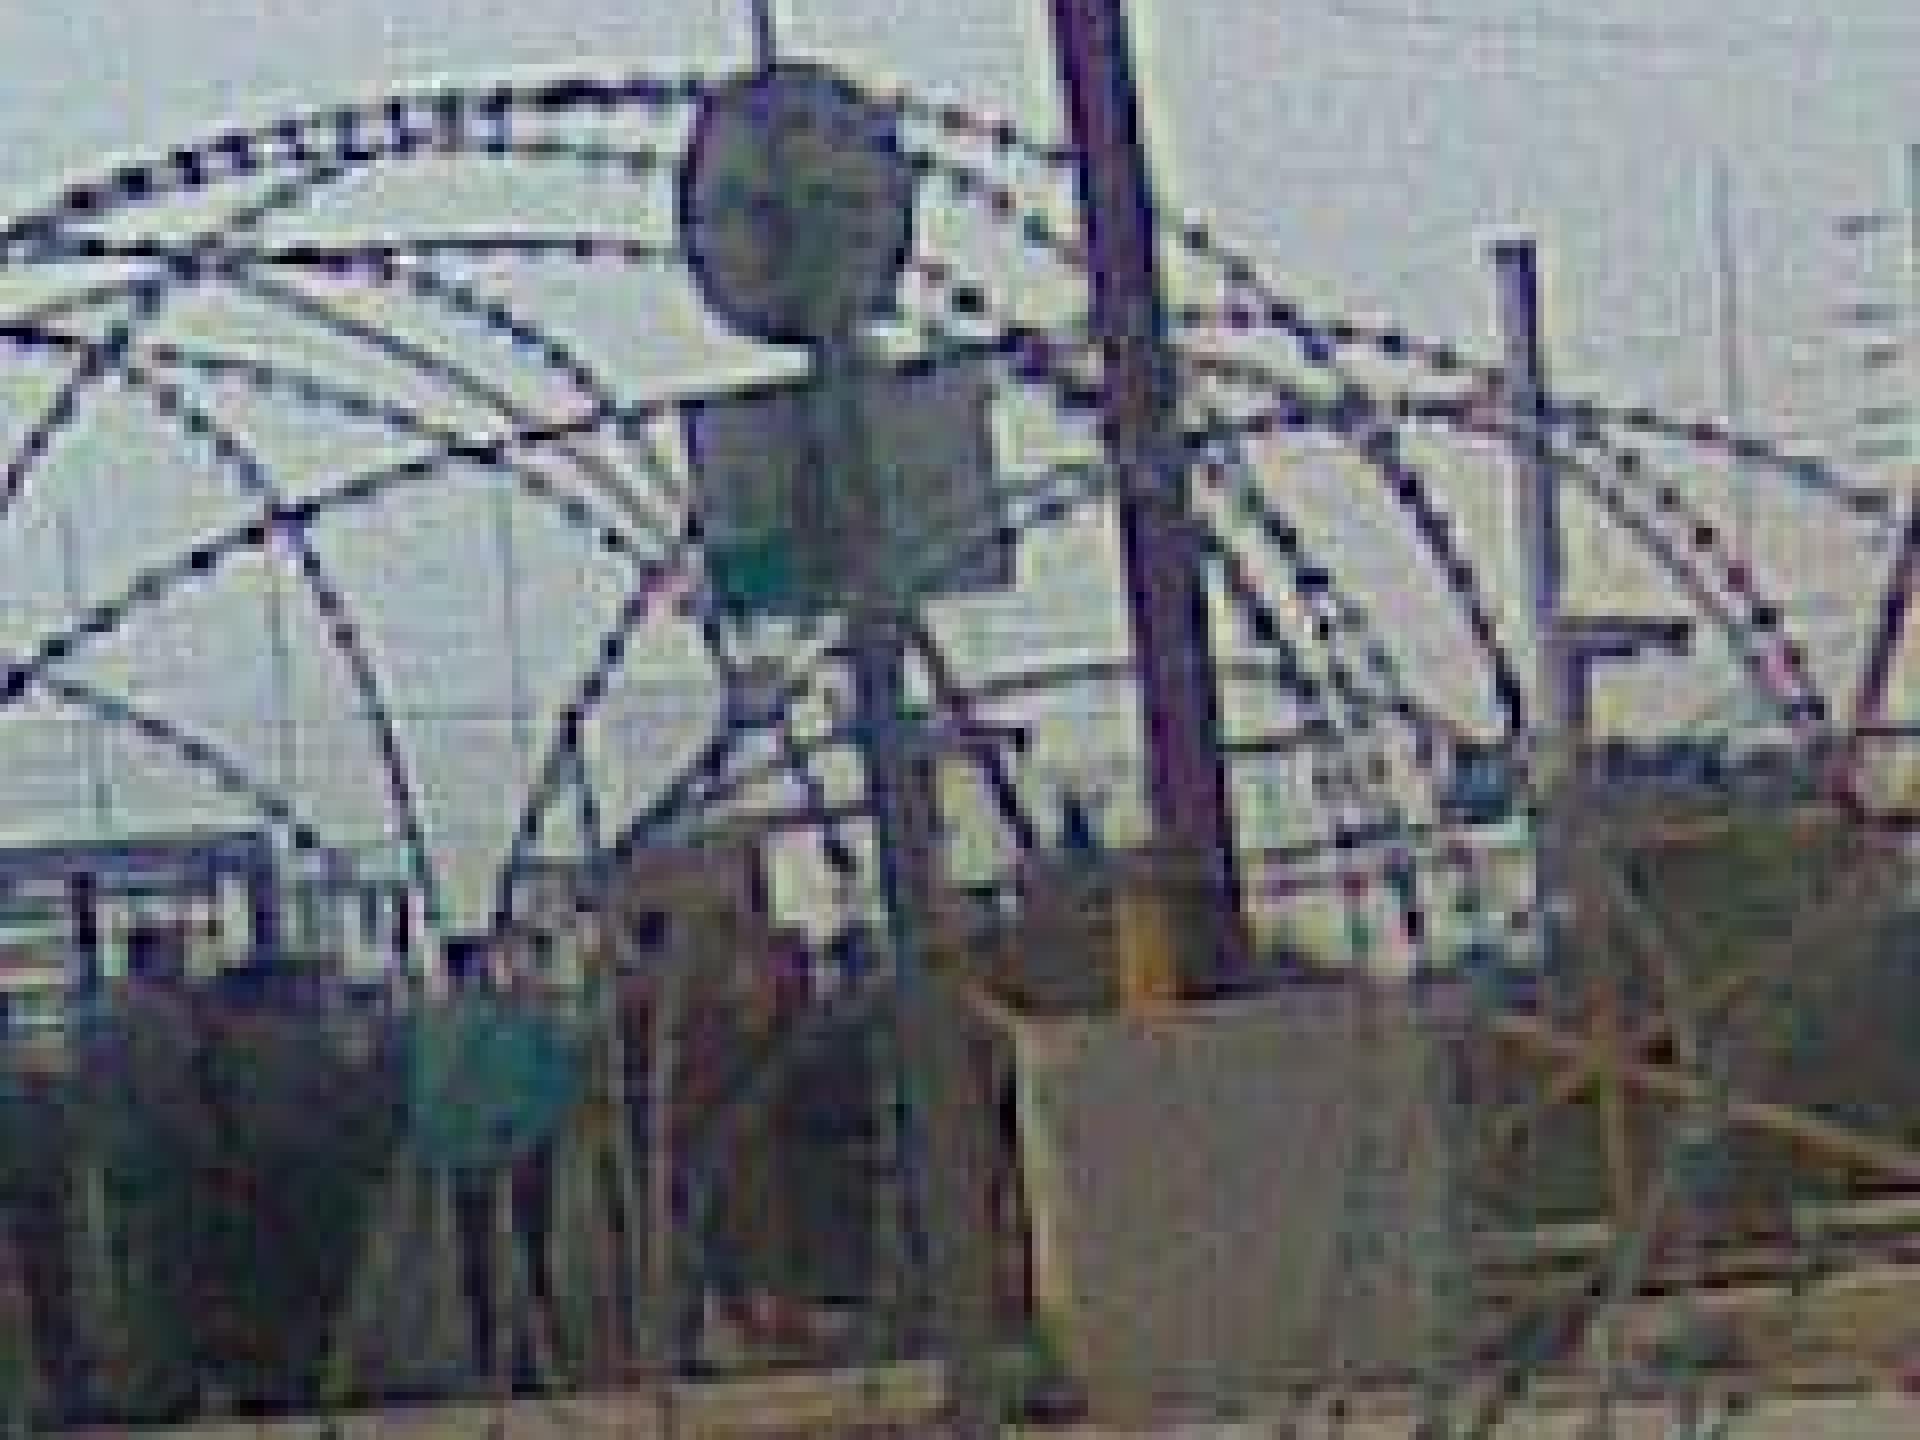 Tura/Shaked checkpoint 09.03.10